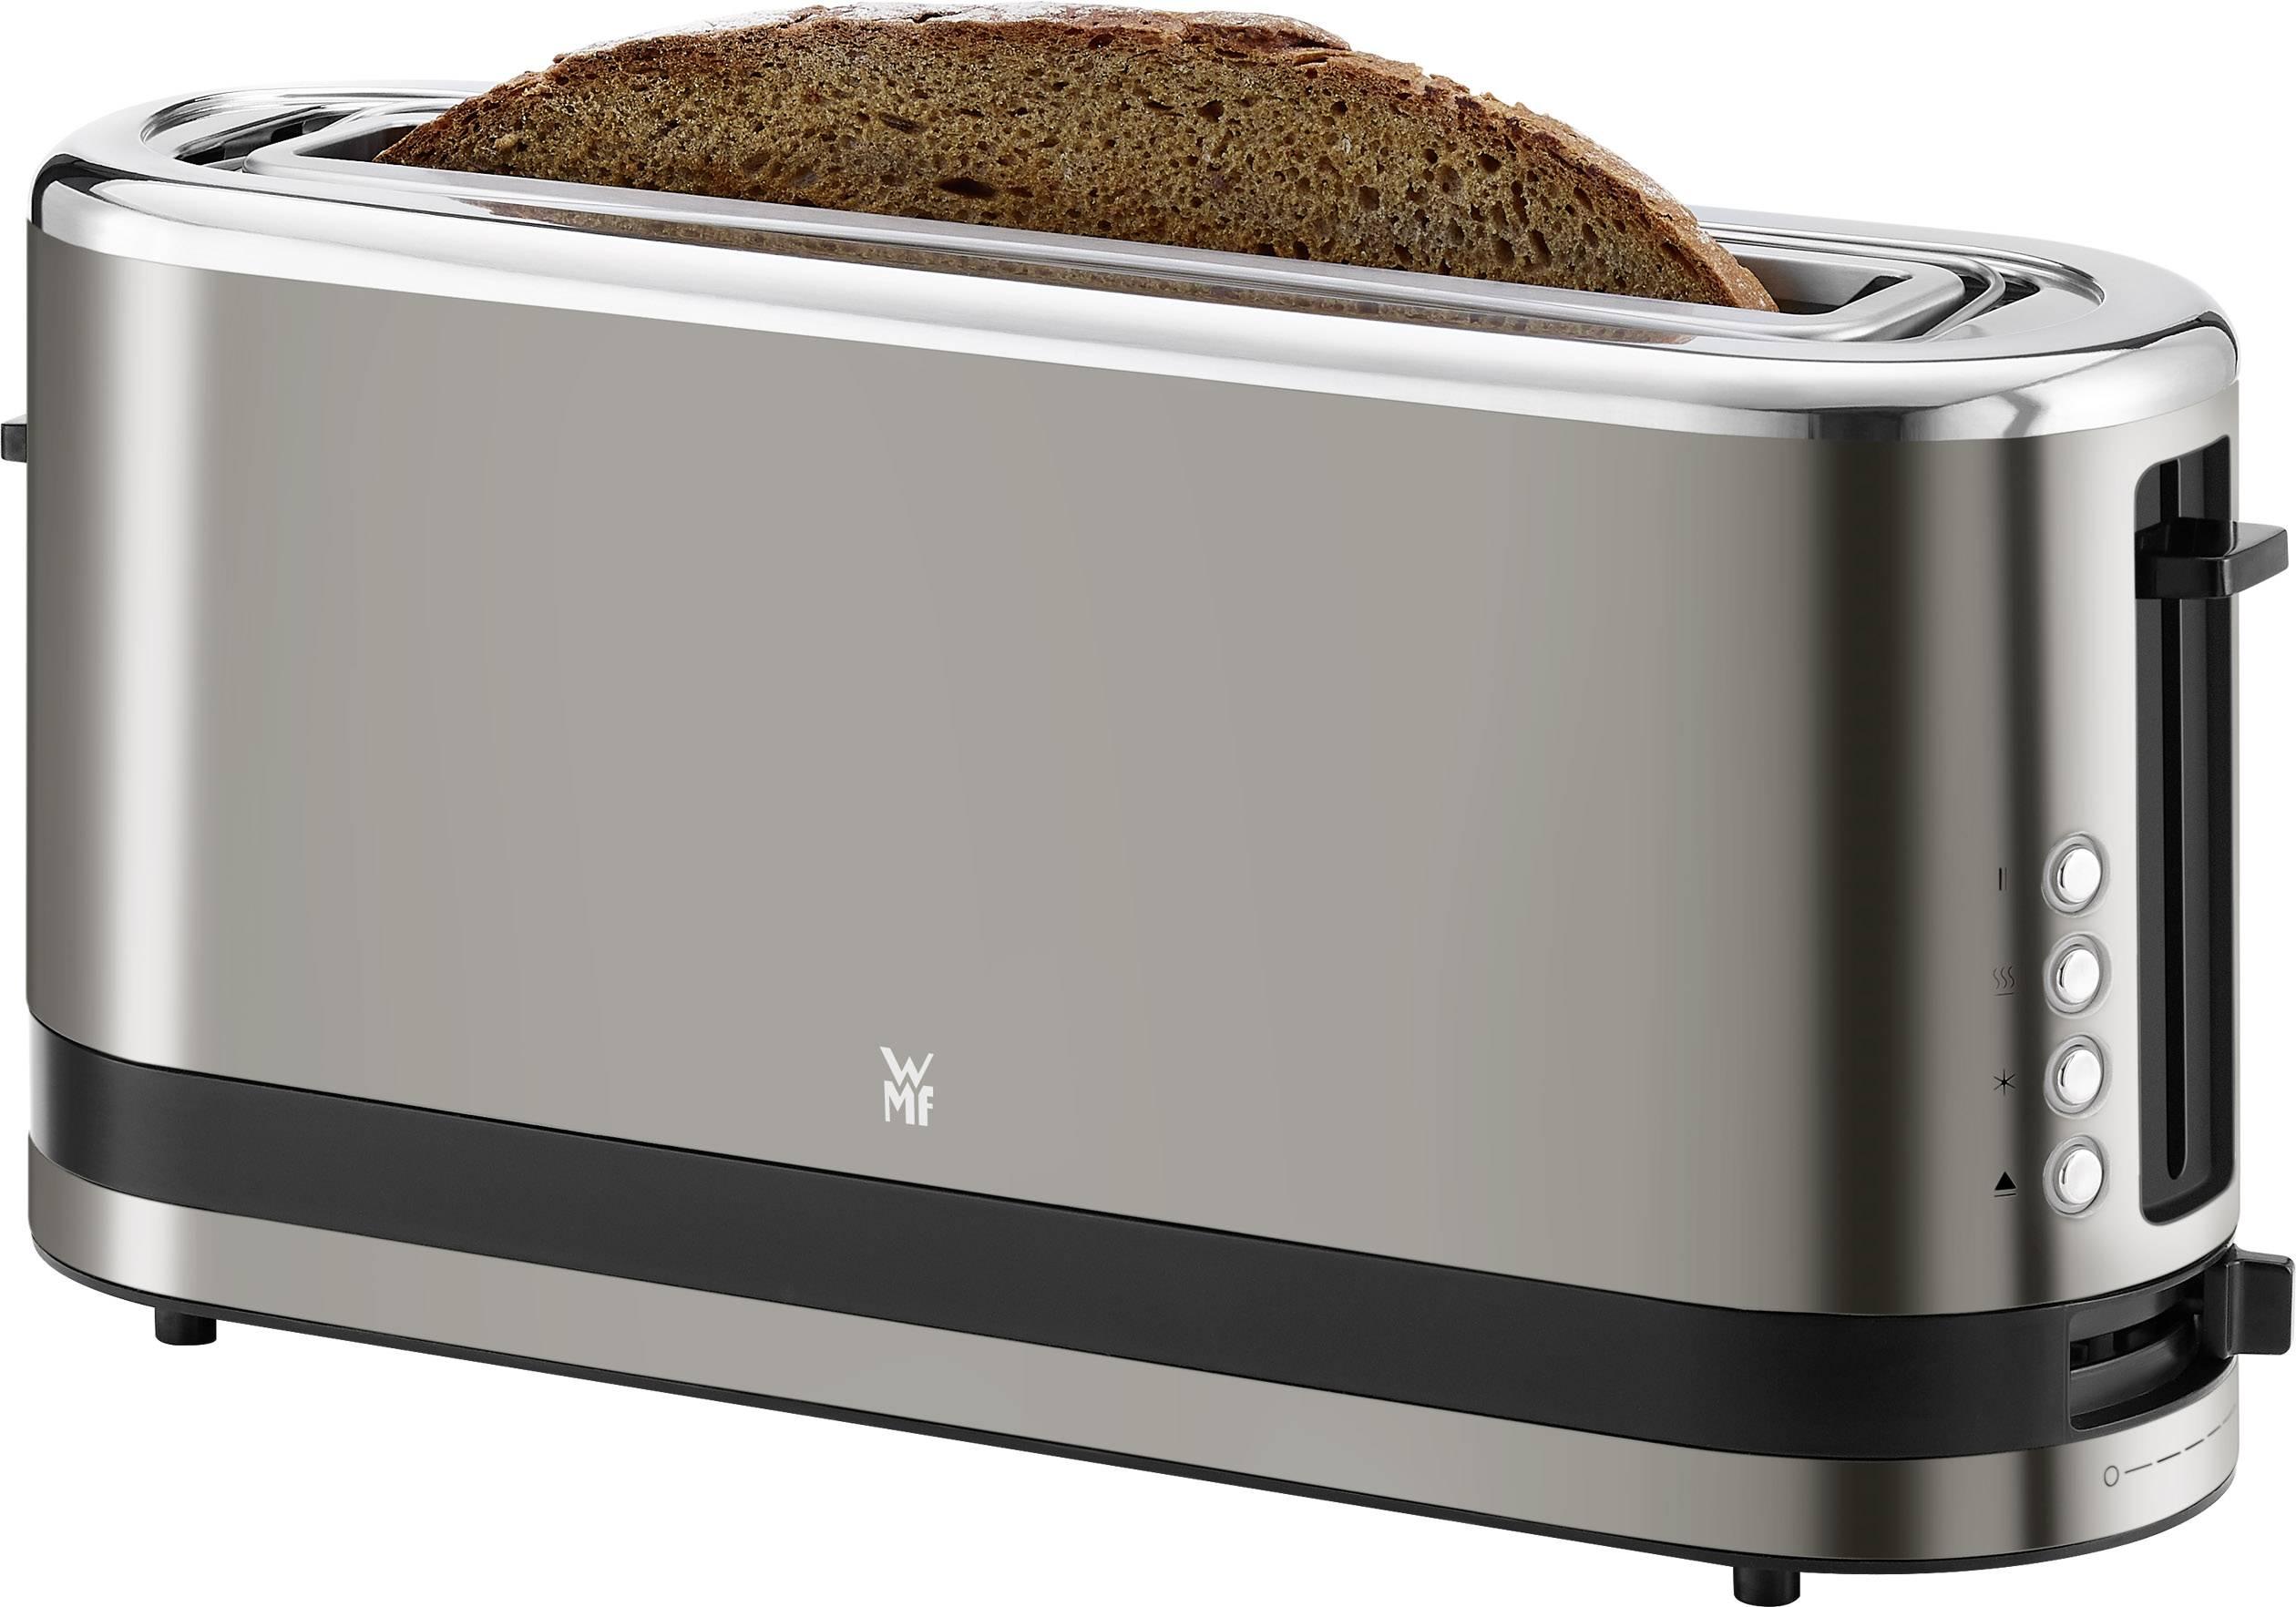 Wmf Elektrogrill Anleitung : Wmf kaffeemaschine lono gebrauchsanweisung wmf espressokocher